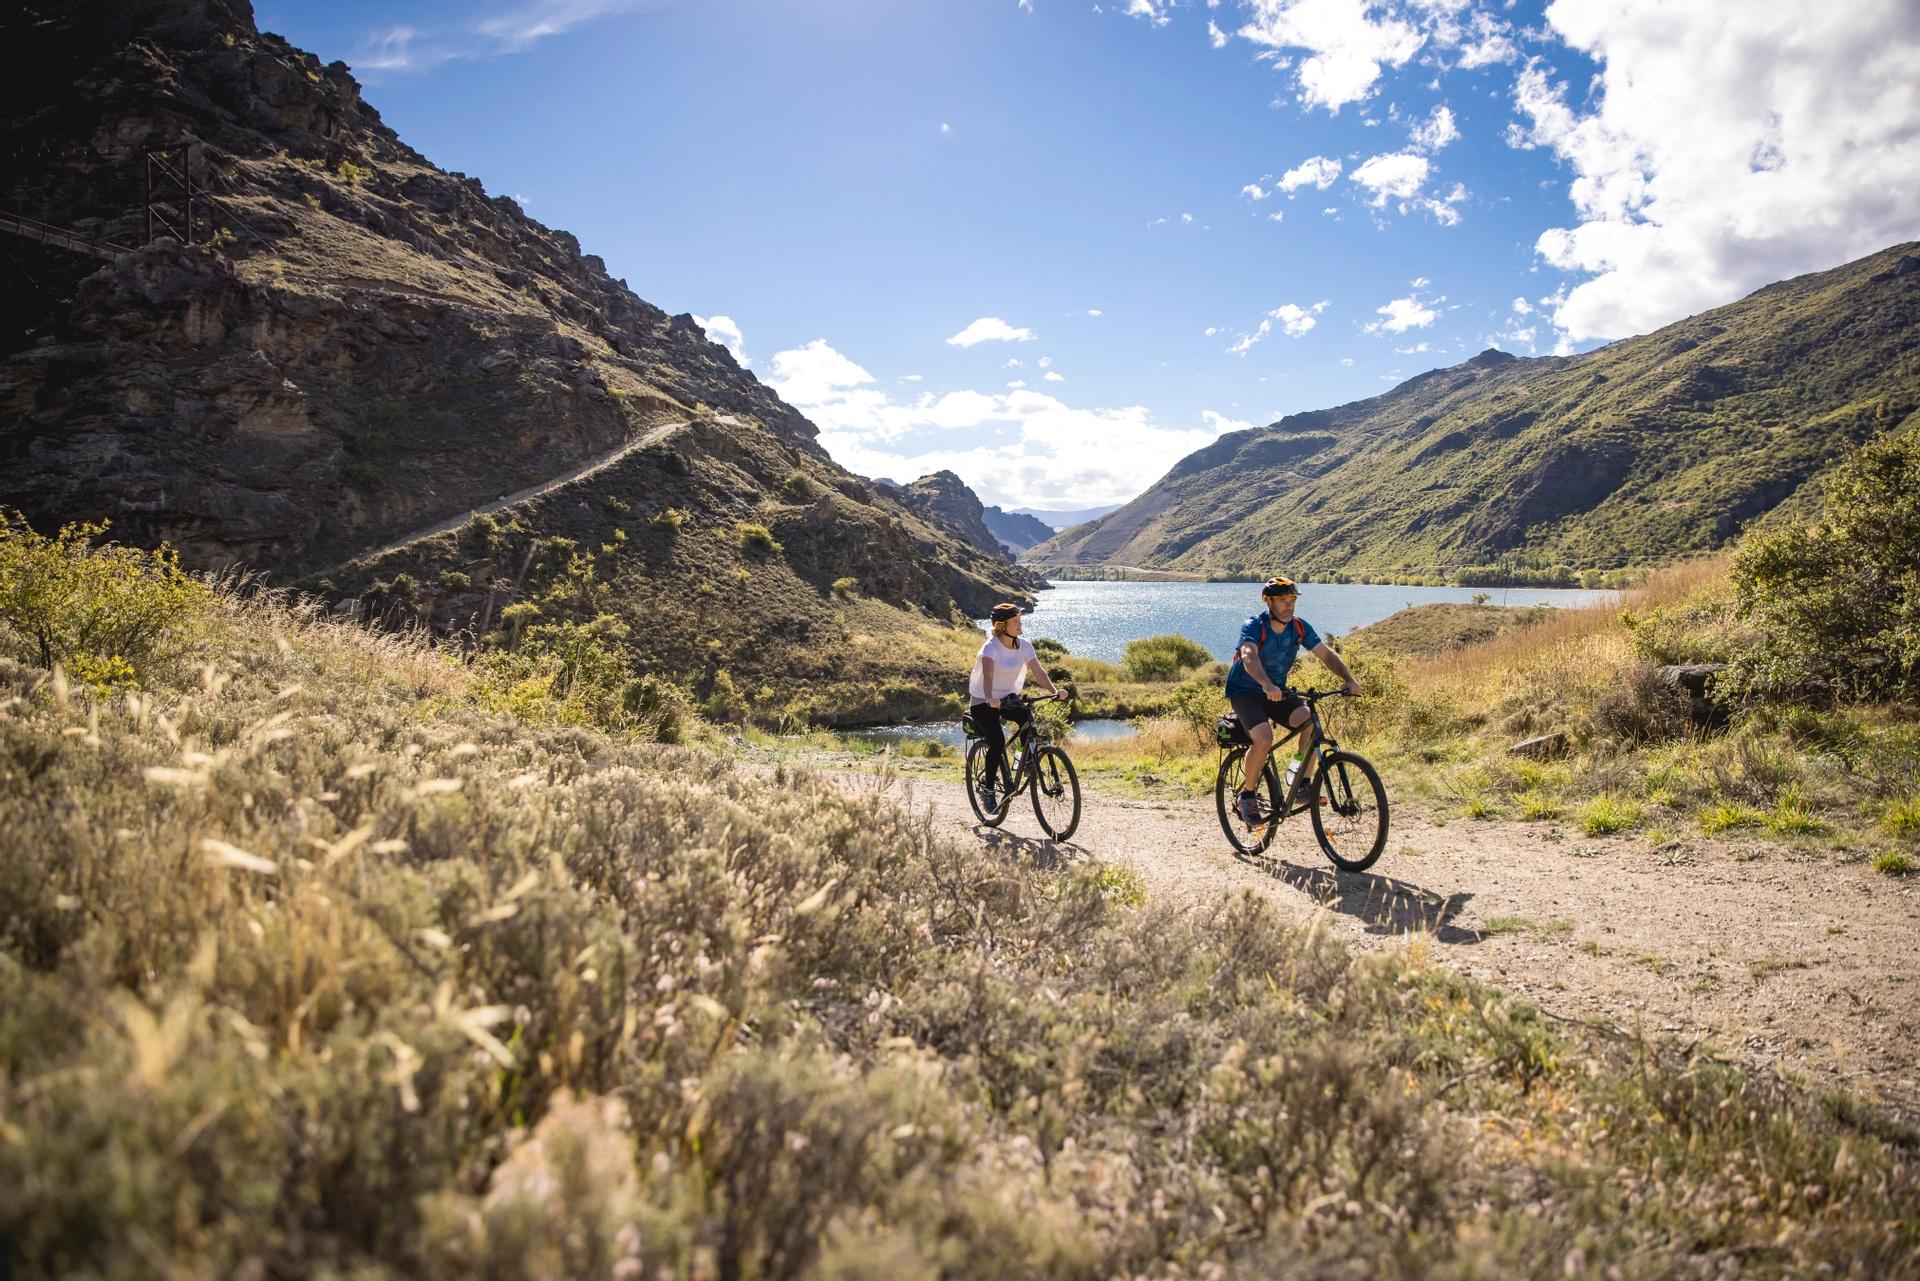 Cycling near Lake Dunstan in Central Otago